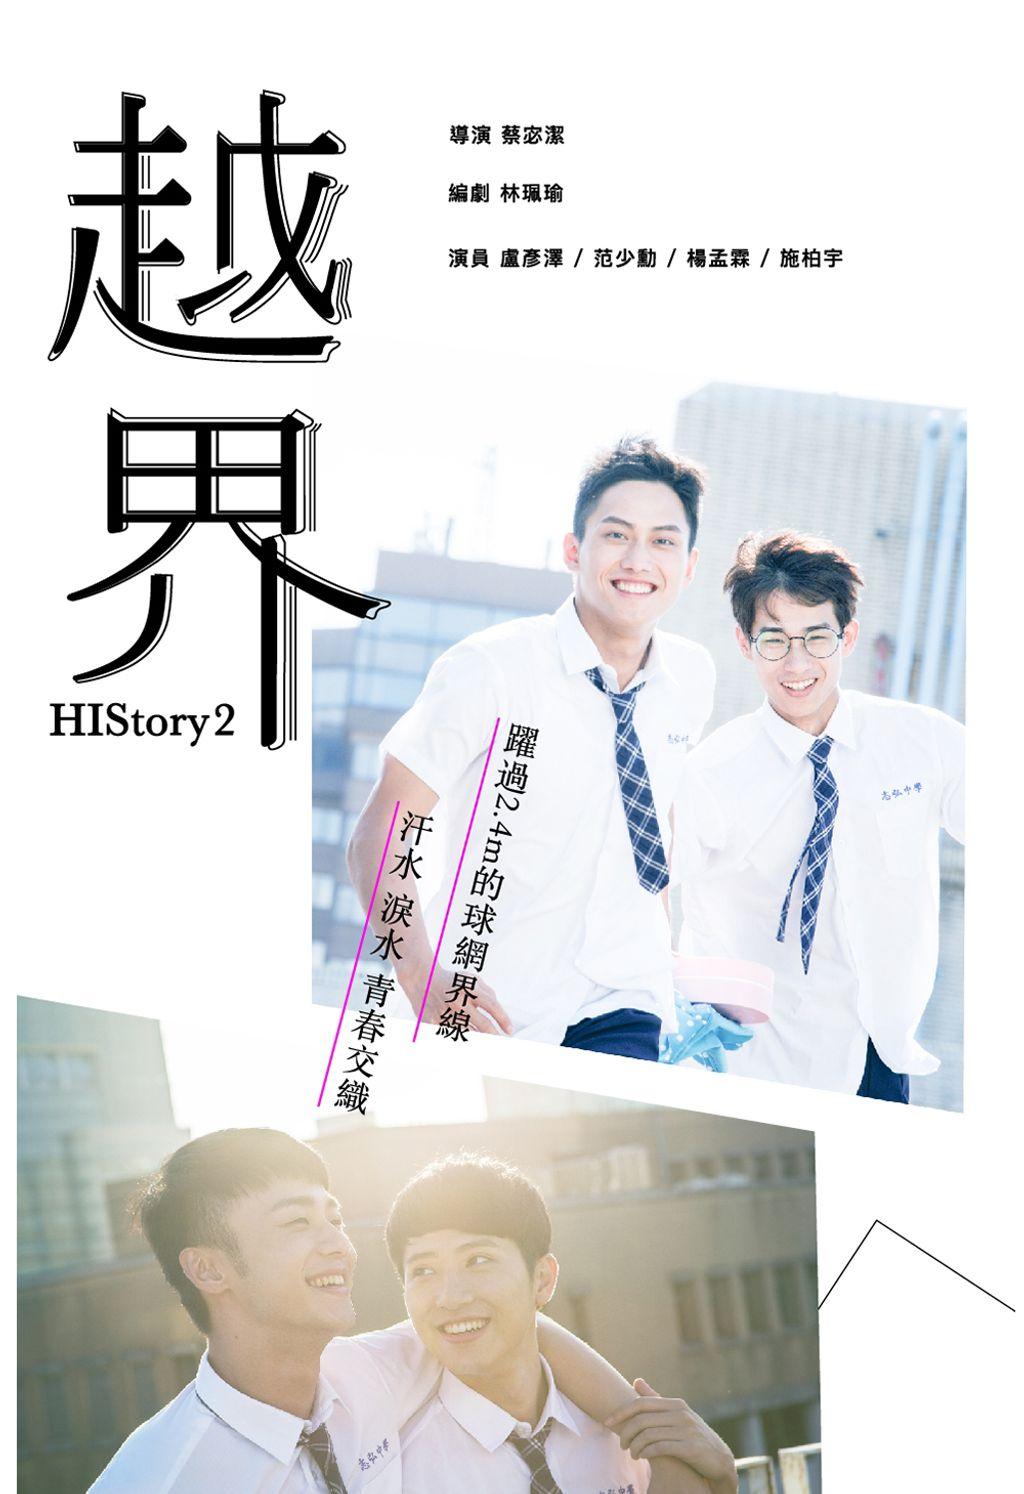 HIStory2-越界 私藏花絮隊長篇 線上看 BL館 LINE TV-精彩隨看